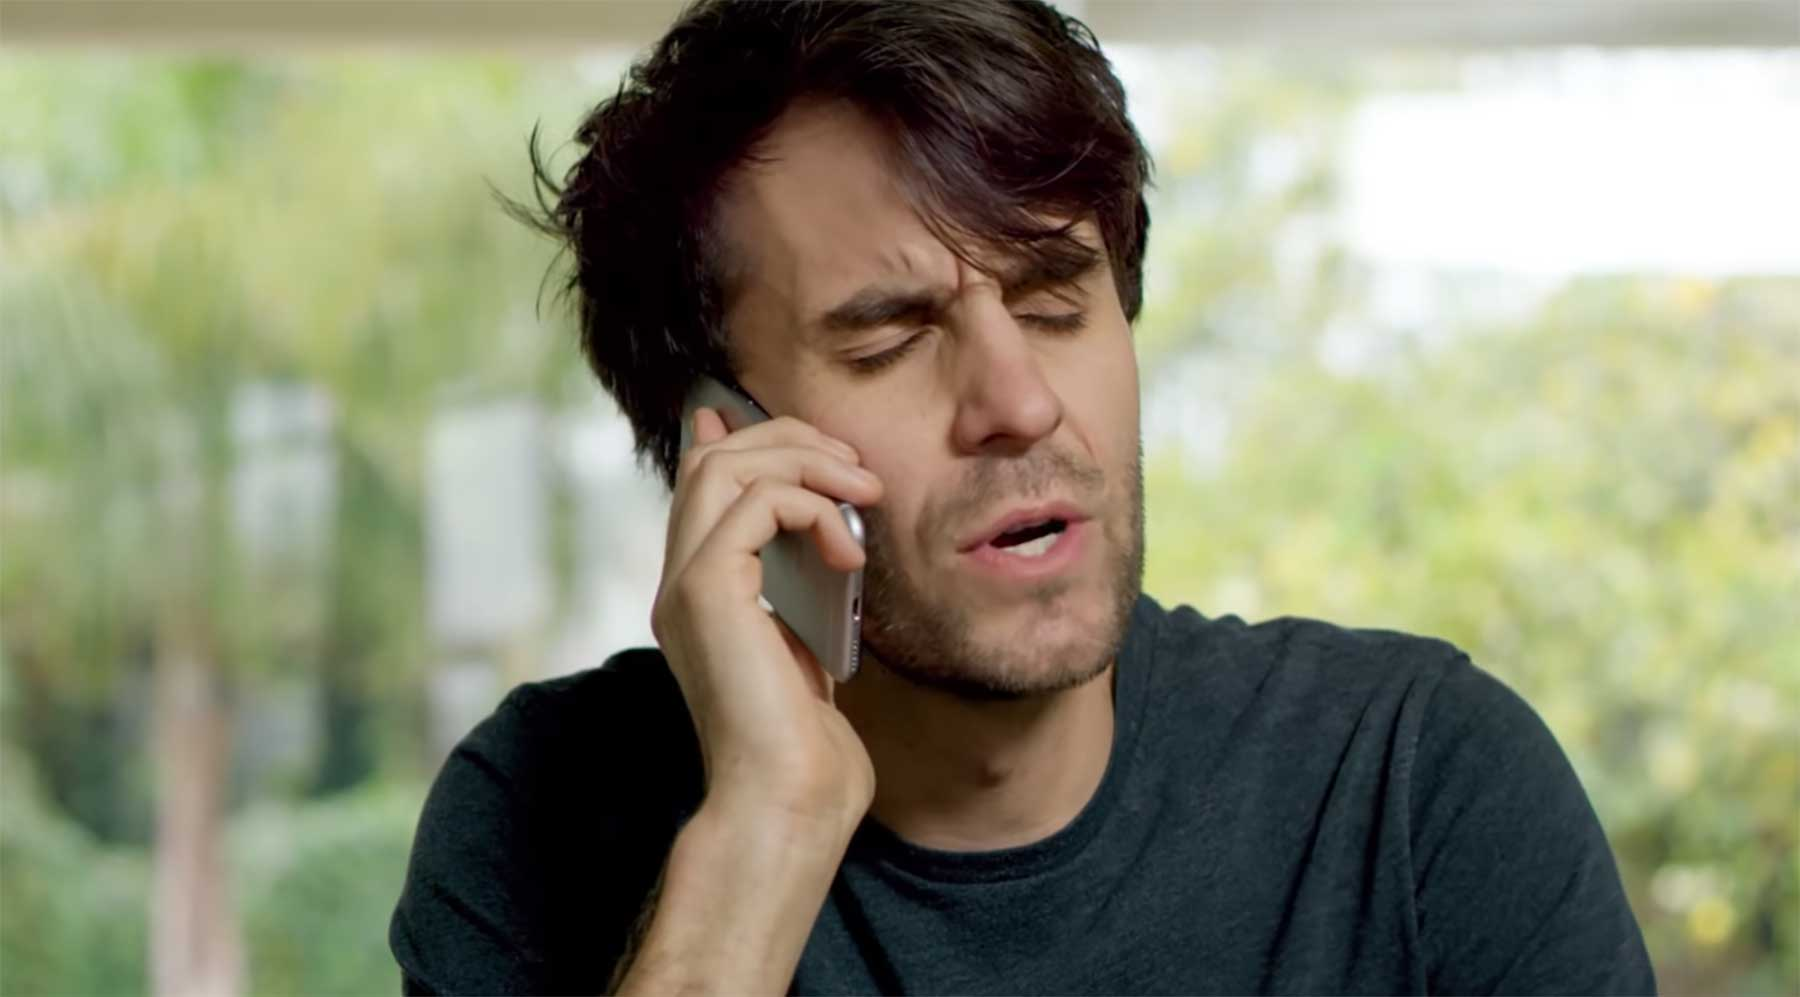 Nummer abgestaubt, doch beim Anruf der Dame geht ihr Callcenter ran call-me-kurzfilm